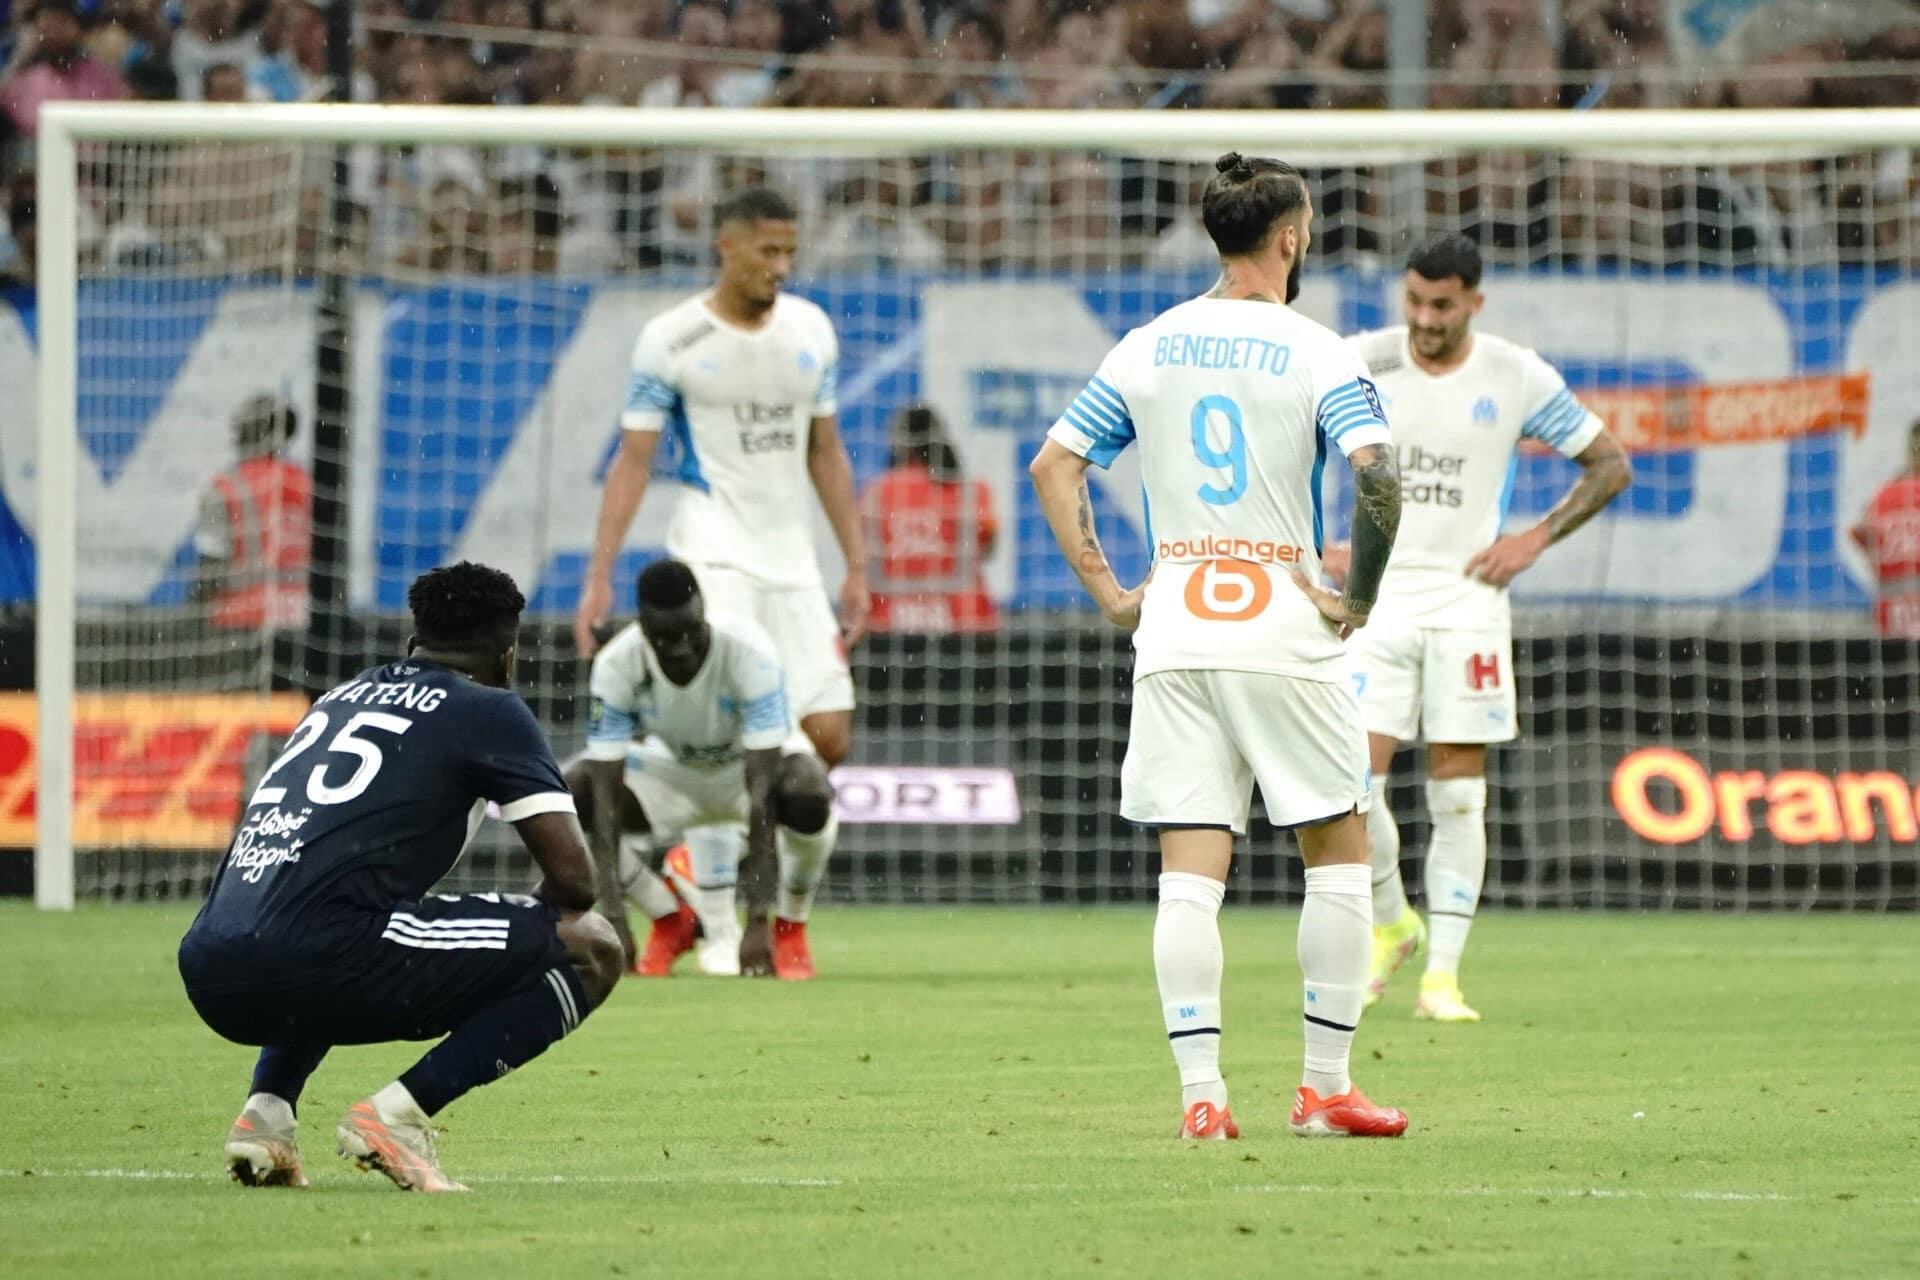 Benedetto, Elche CF, Olympique de Marsella, Ligue 1, Liga Santander, Lucas Boyé, Pablo Piatti, delantero argentino